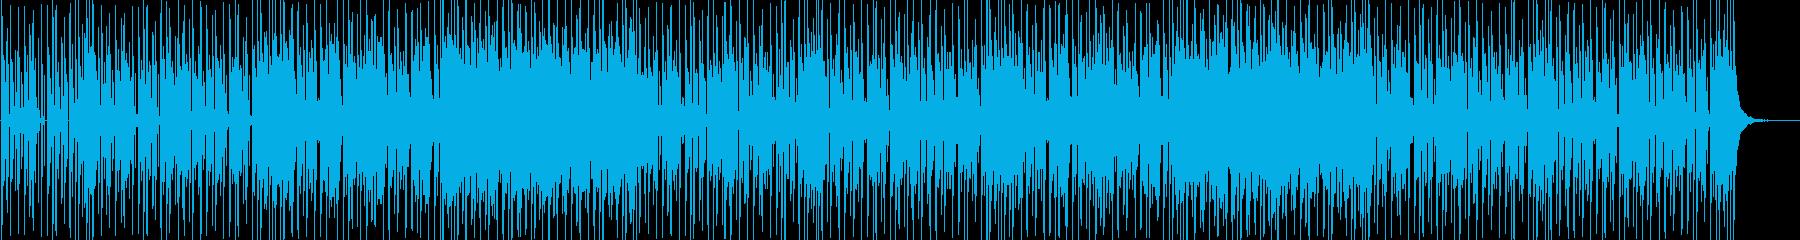 Hip-hop 広い 壮大 ゆっく...の再生済みの波形